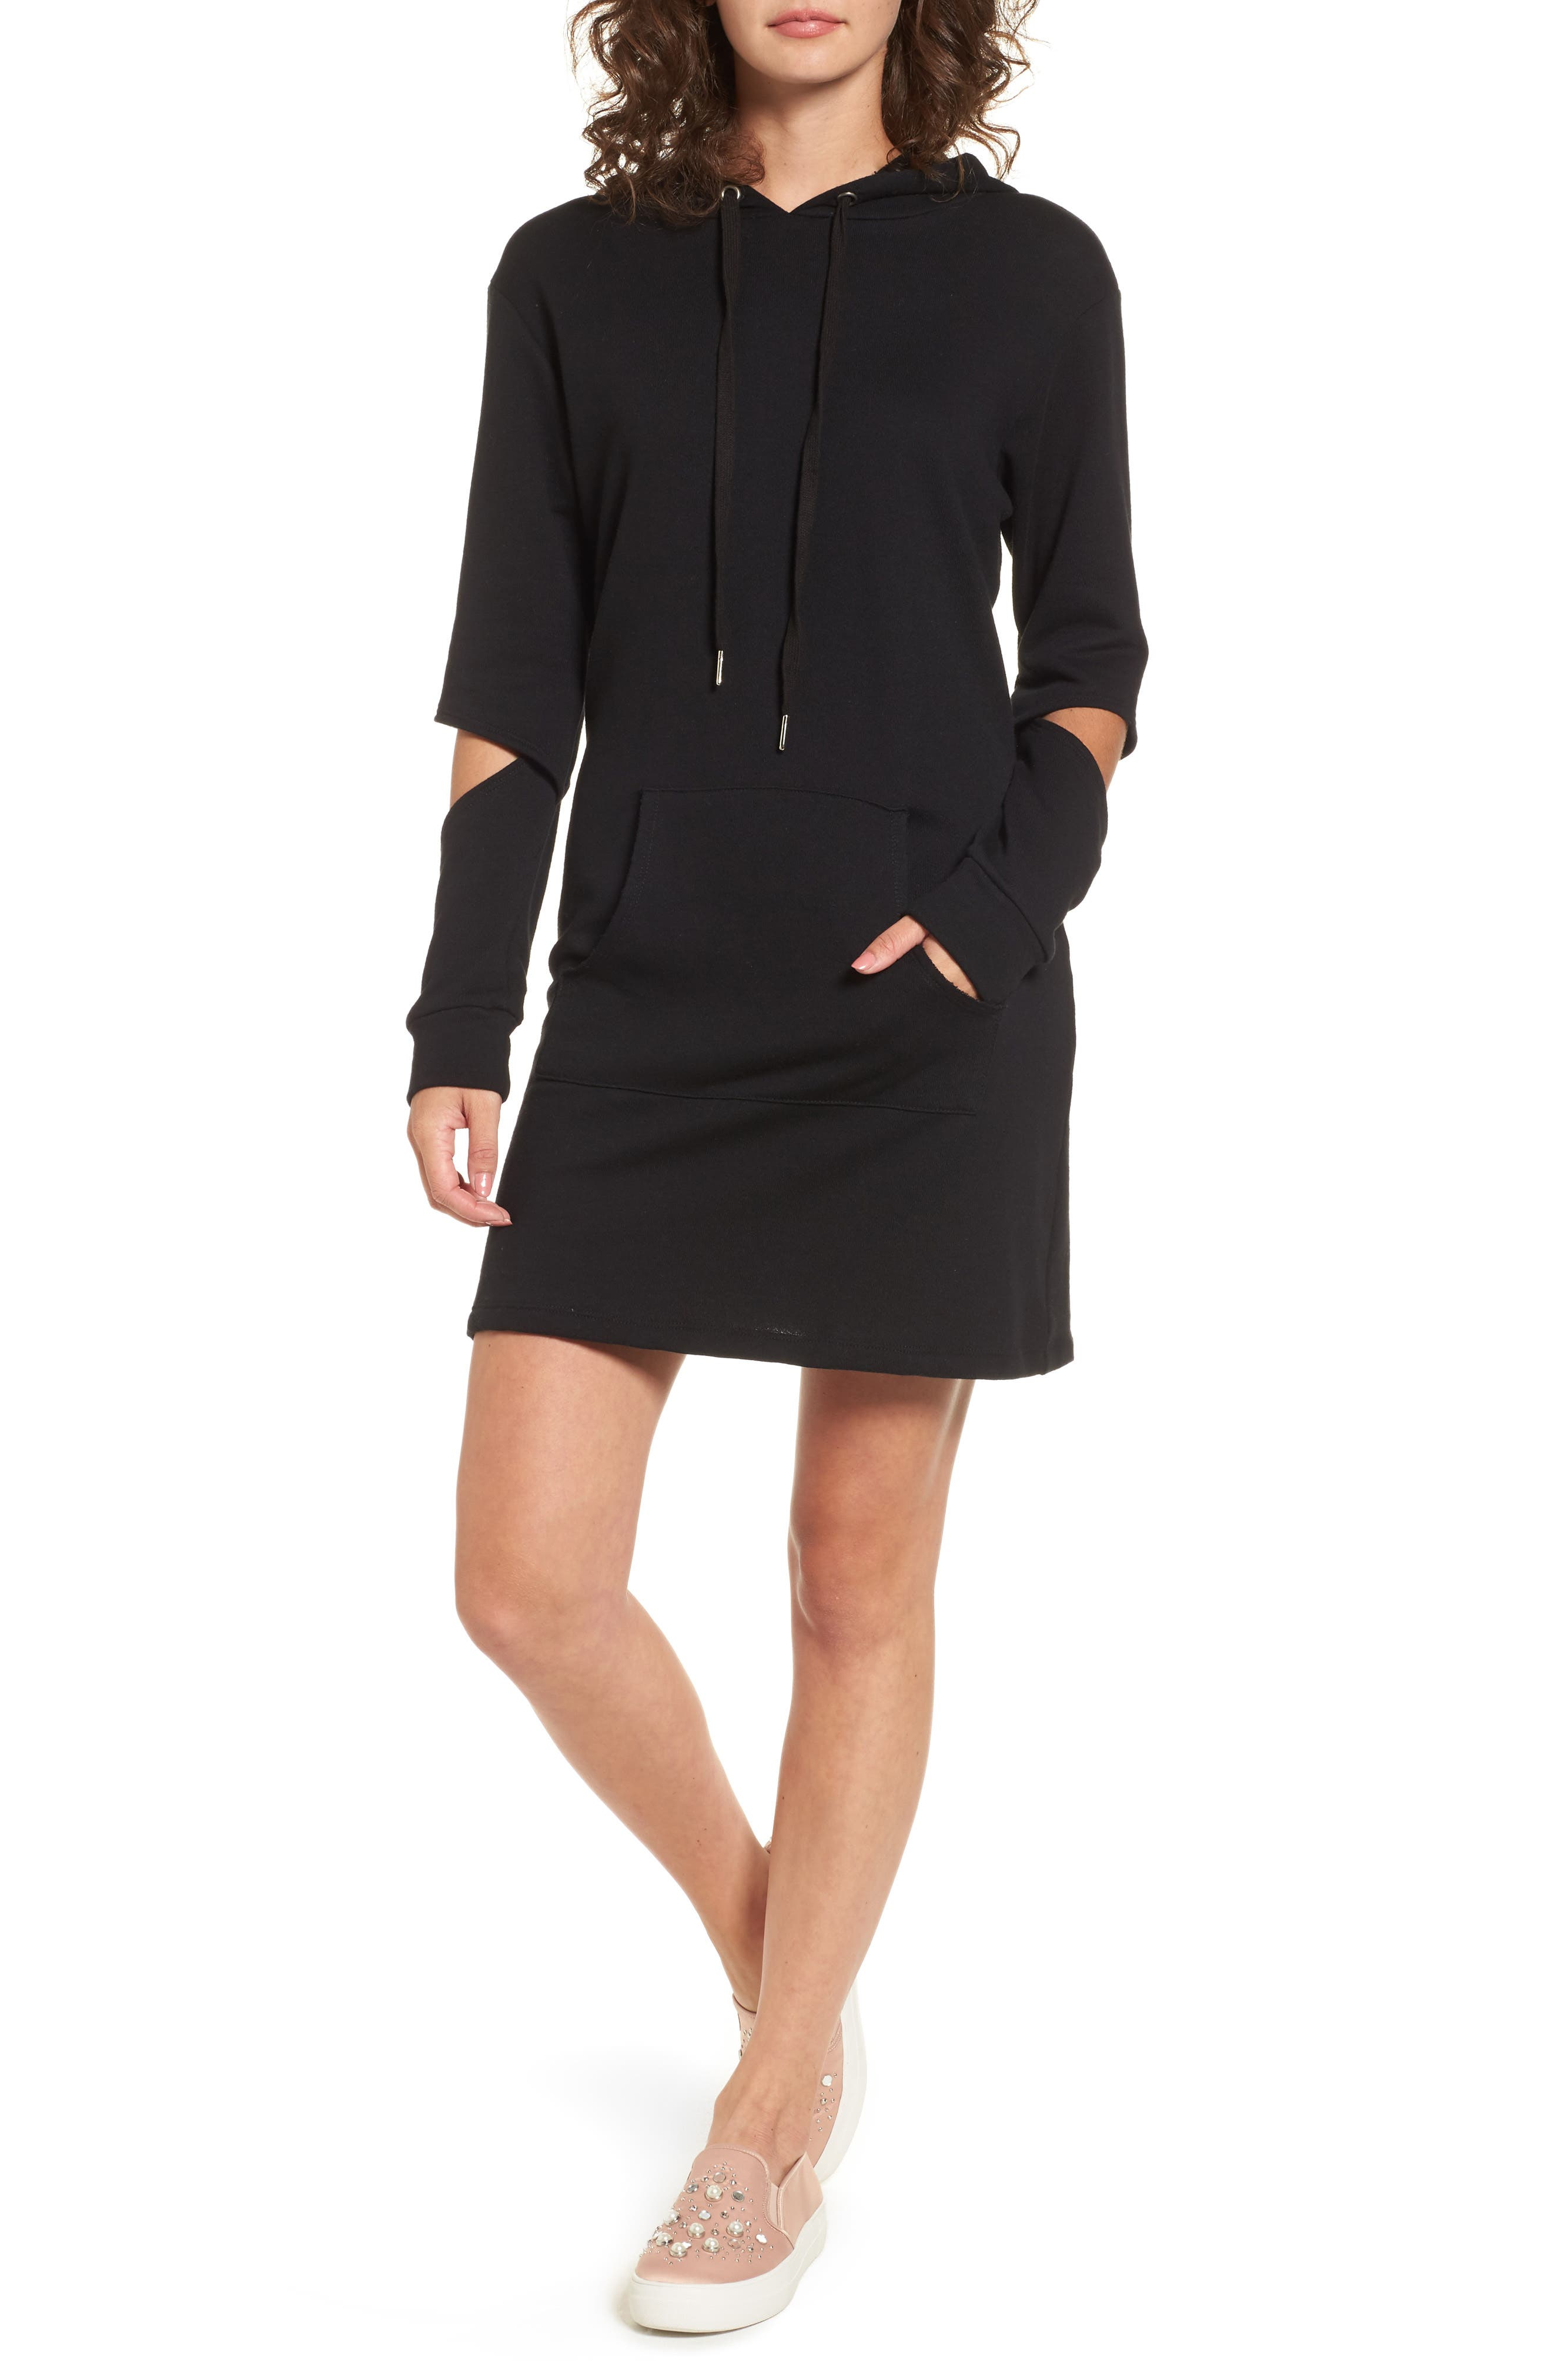 Socialite Cutout Sleeve Hoodie Dress